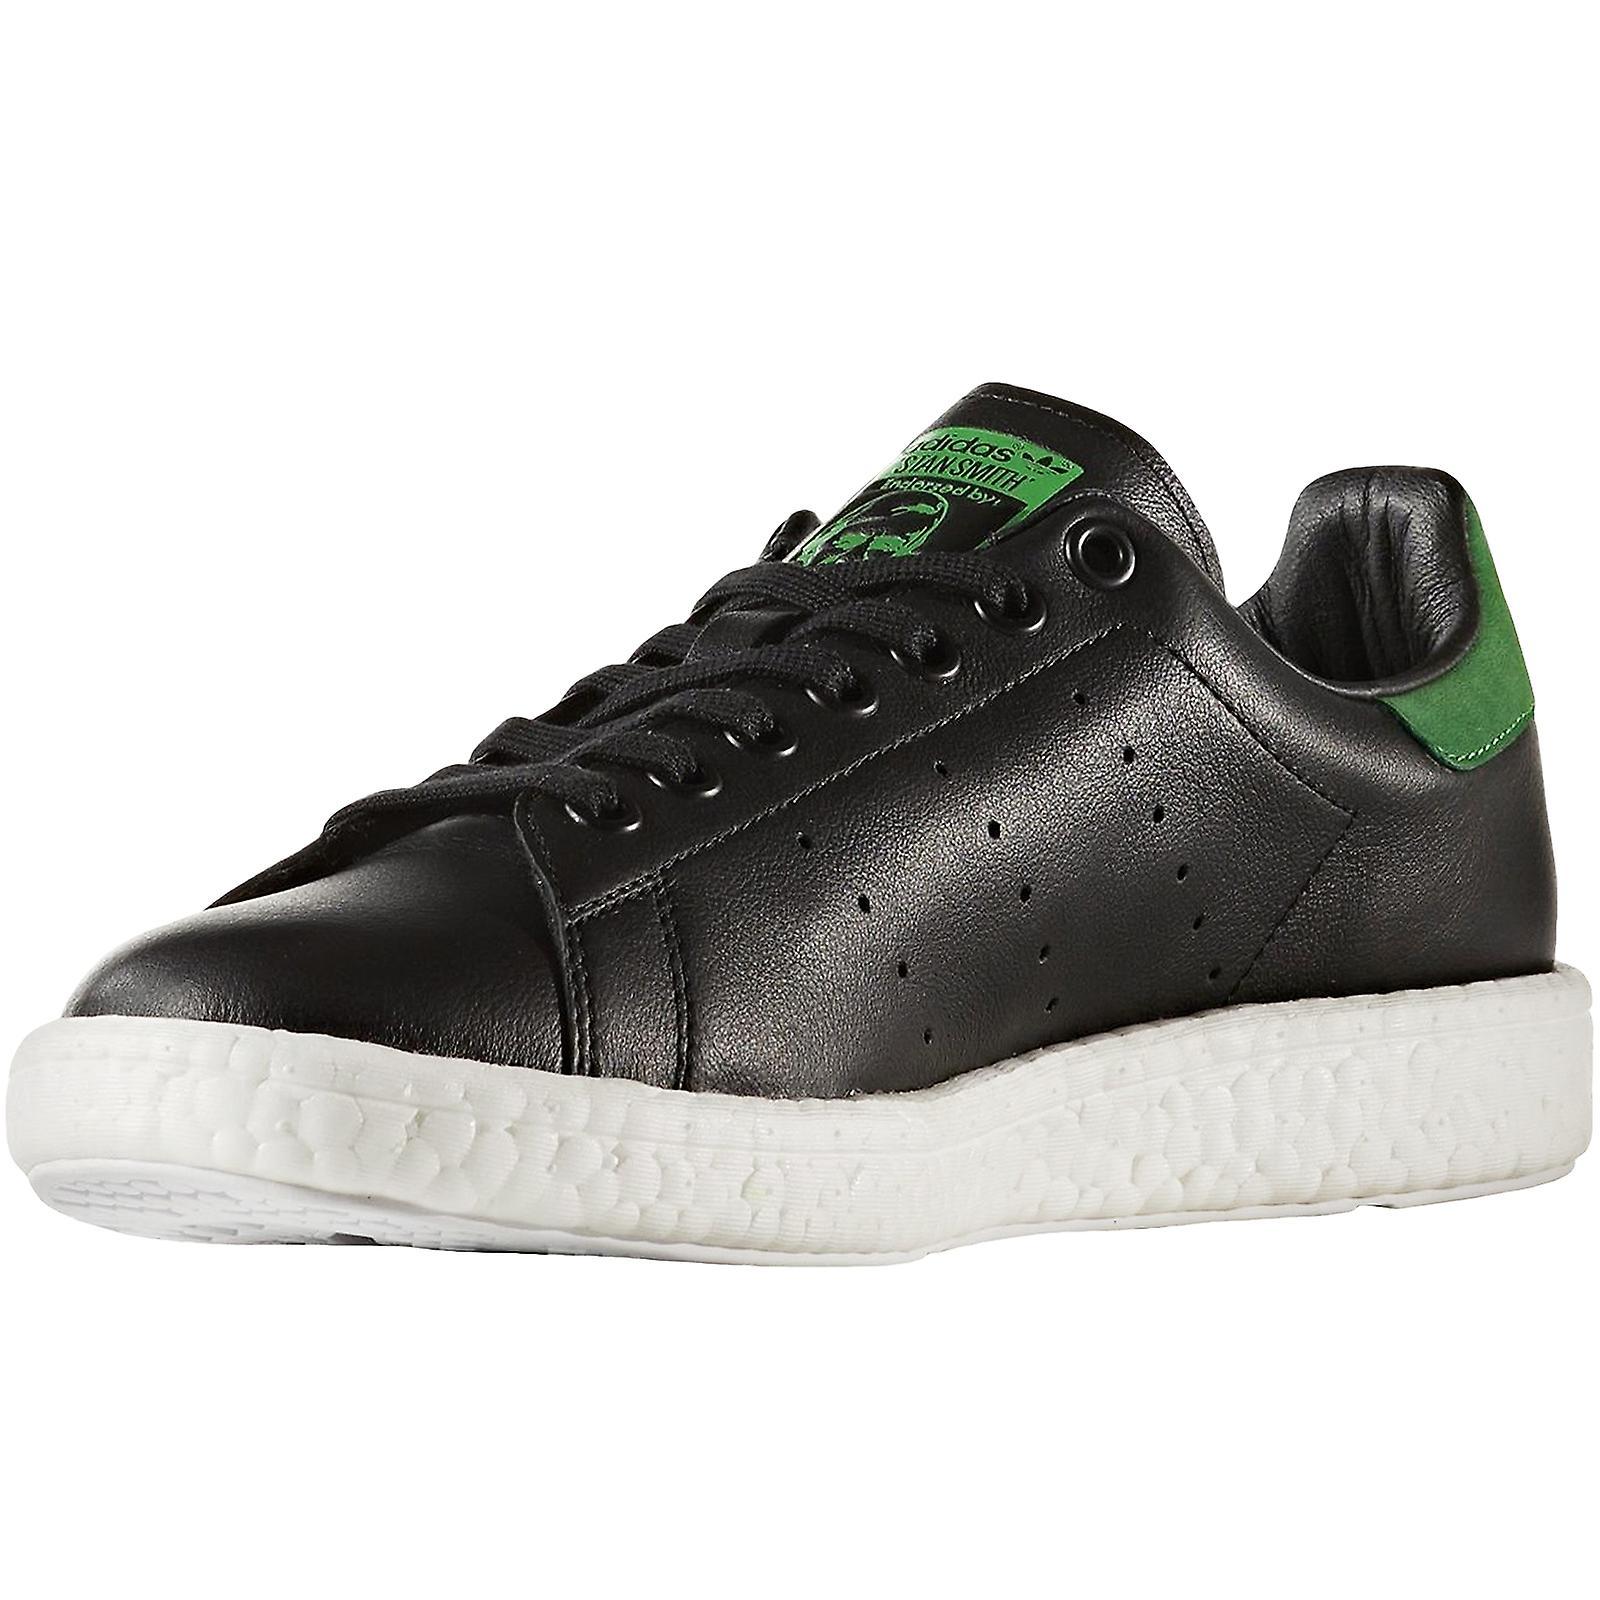 adidas Originals Mens Stan Smith Boost Low Rise Lace Up Trainers - Noir/Vert